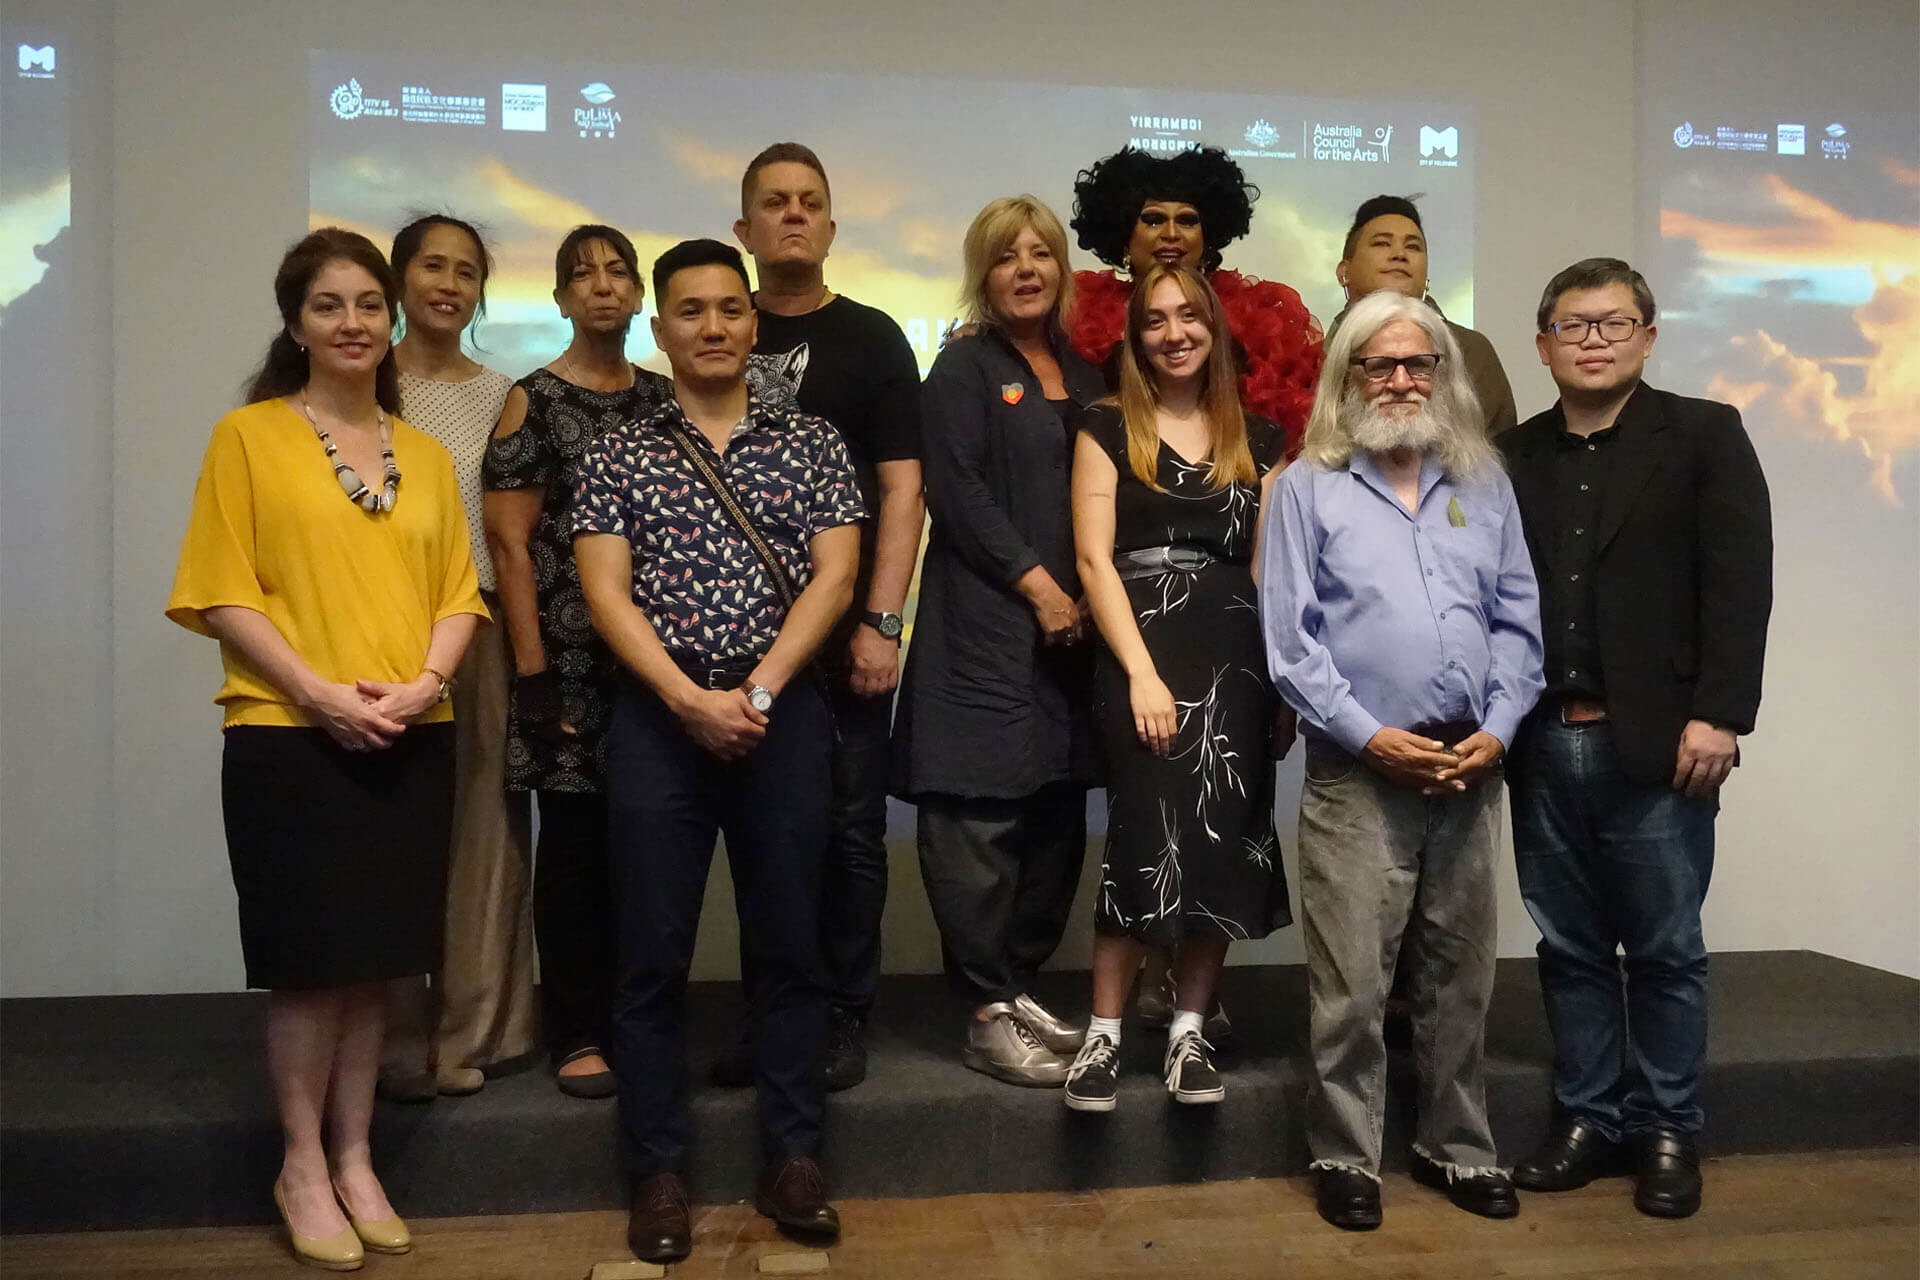 「2018PULIMA藝術節」X 澳洲「Yirramboi明日藝術節」記者會